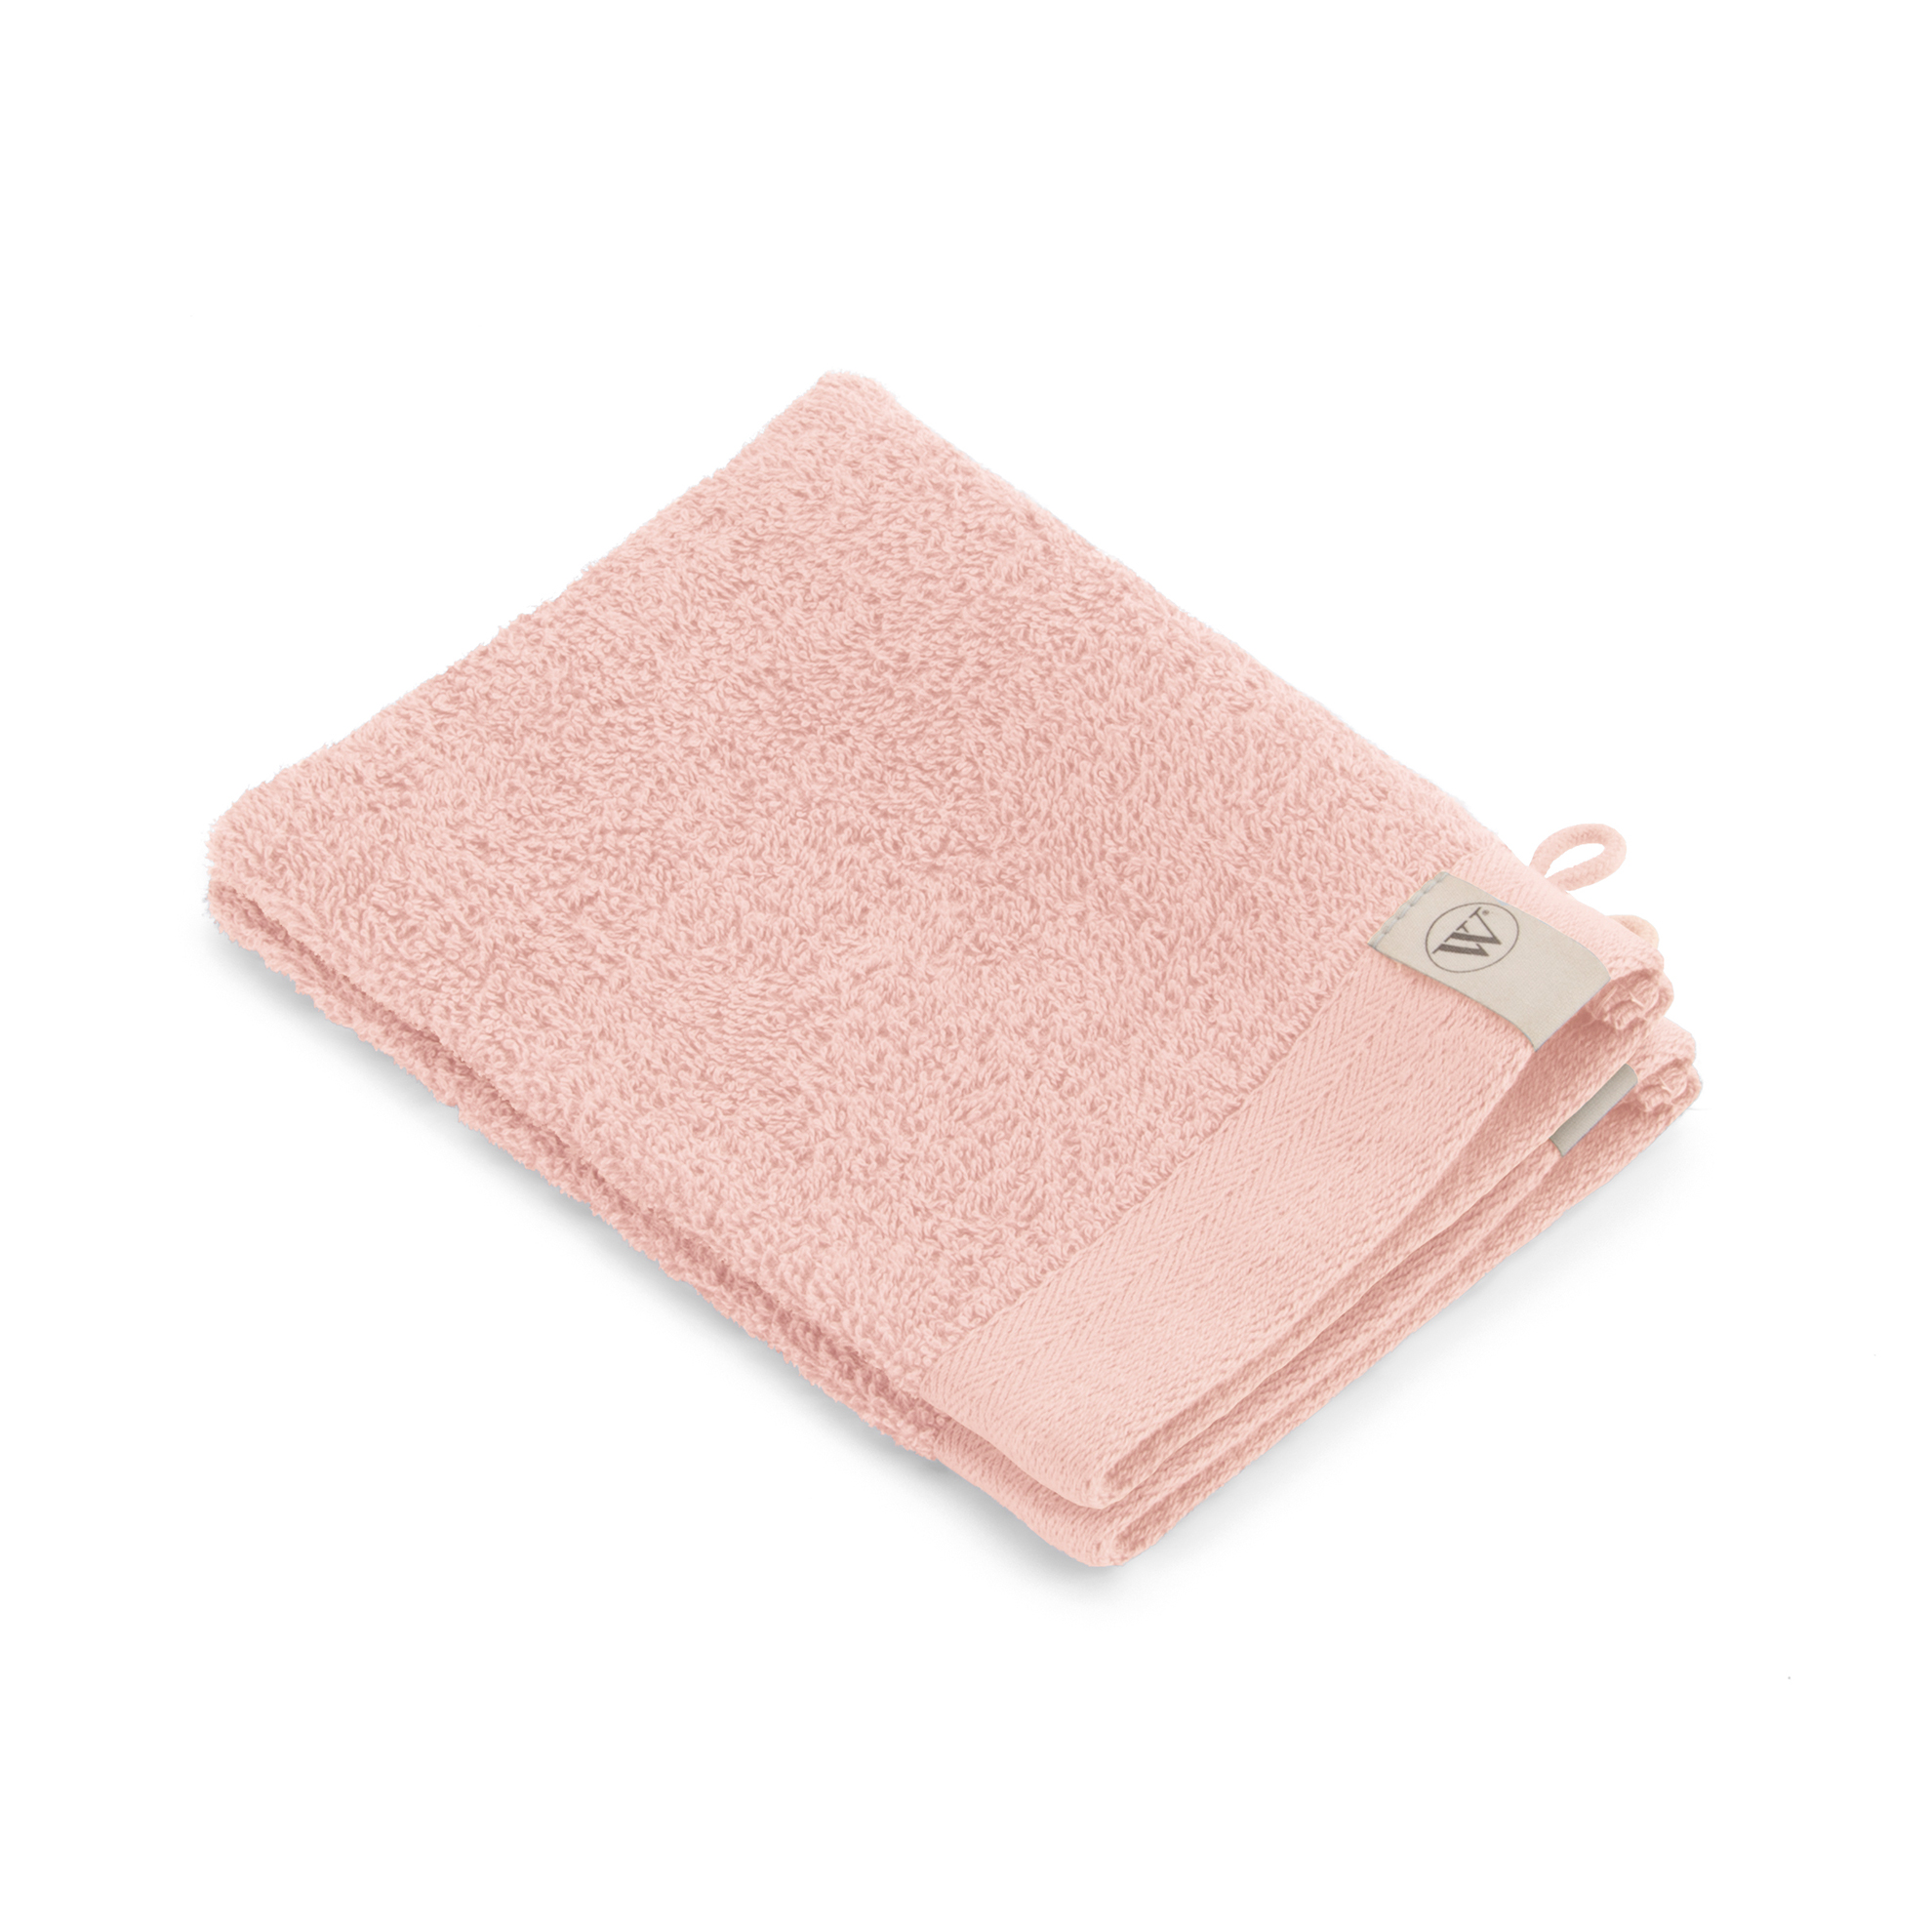 Walra Soft Cotton Washandje 16x21 cm 550 gram Roze - 2 stuks